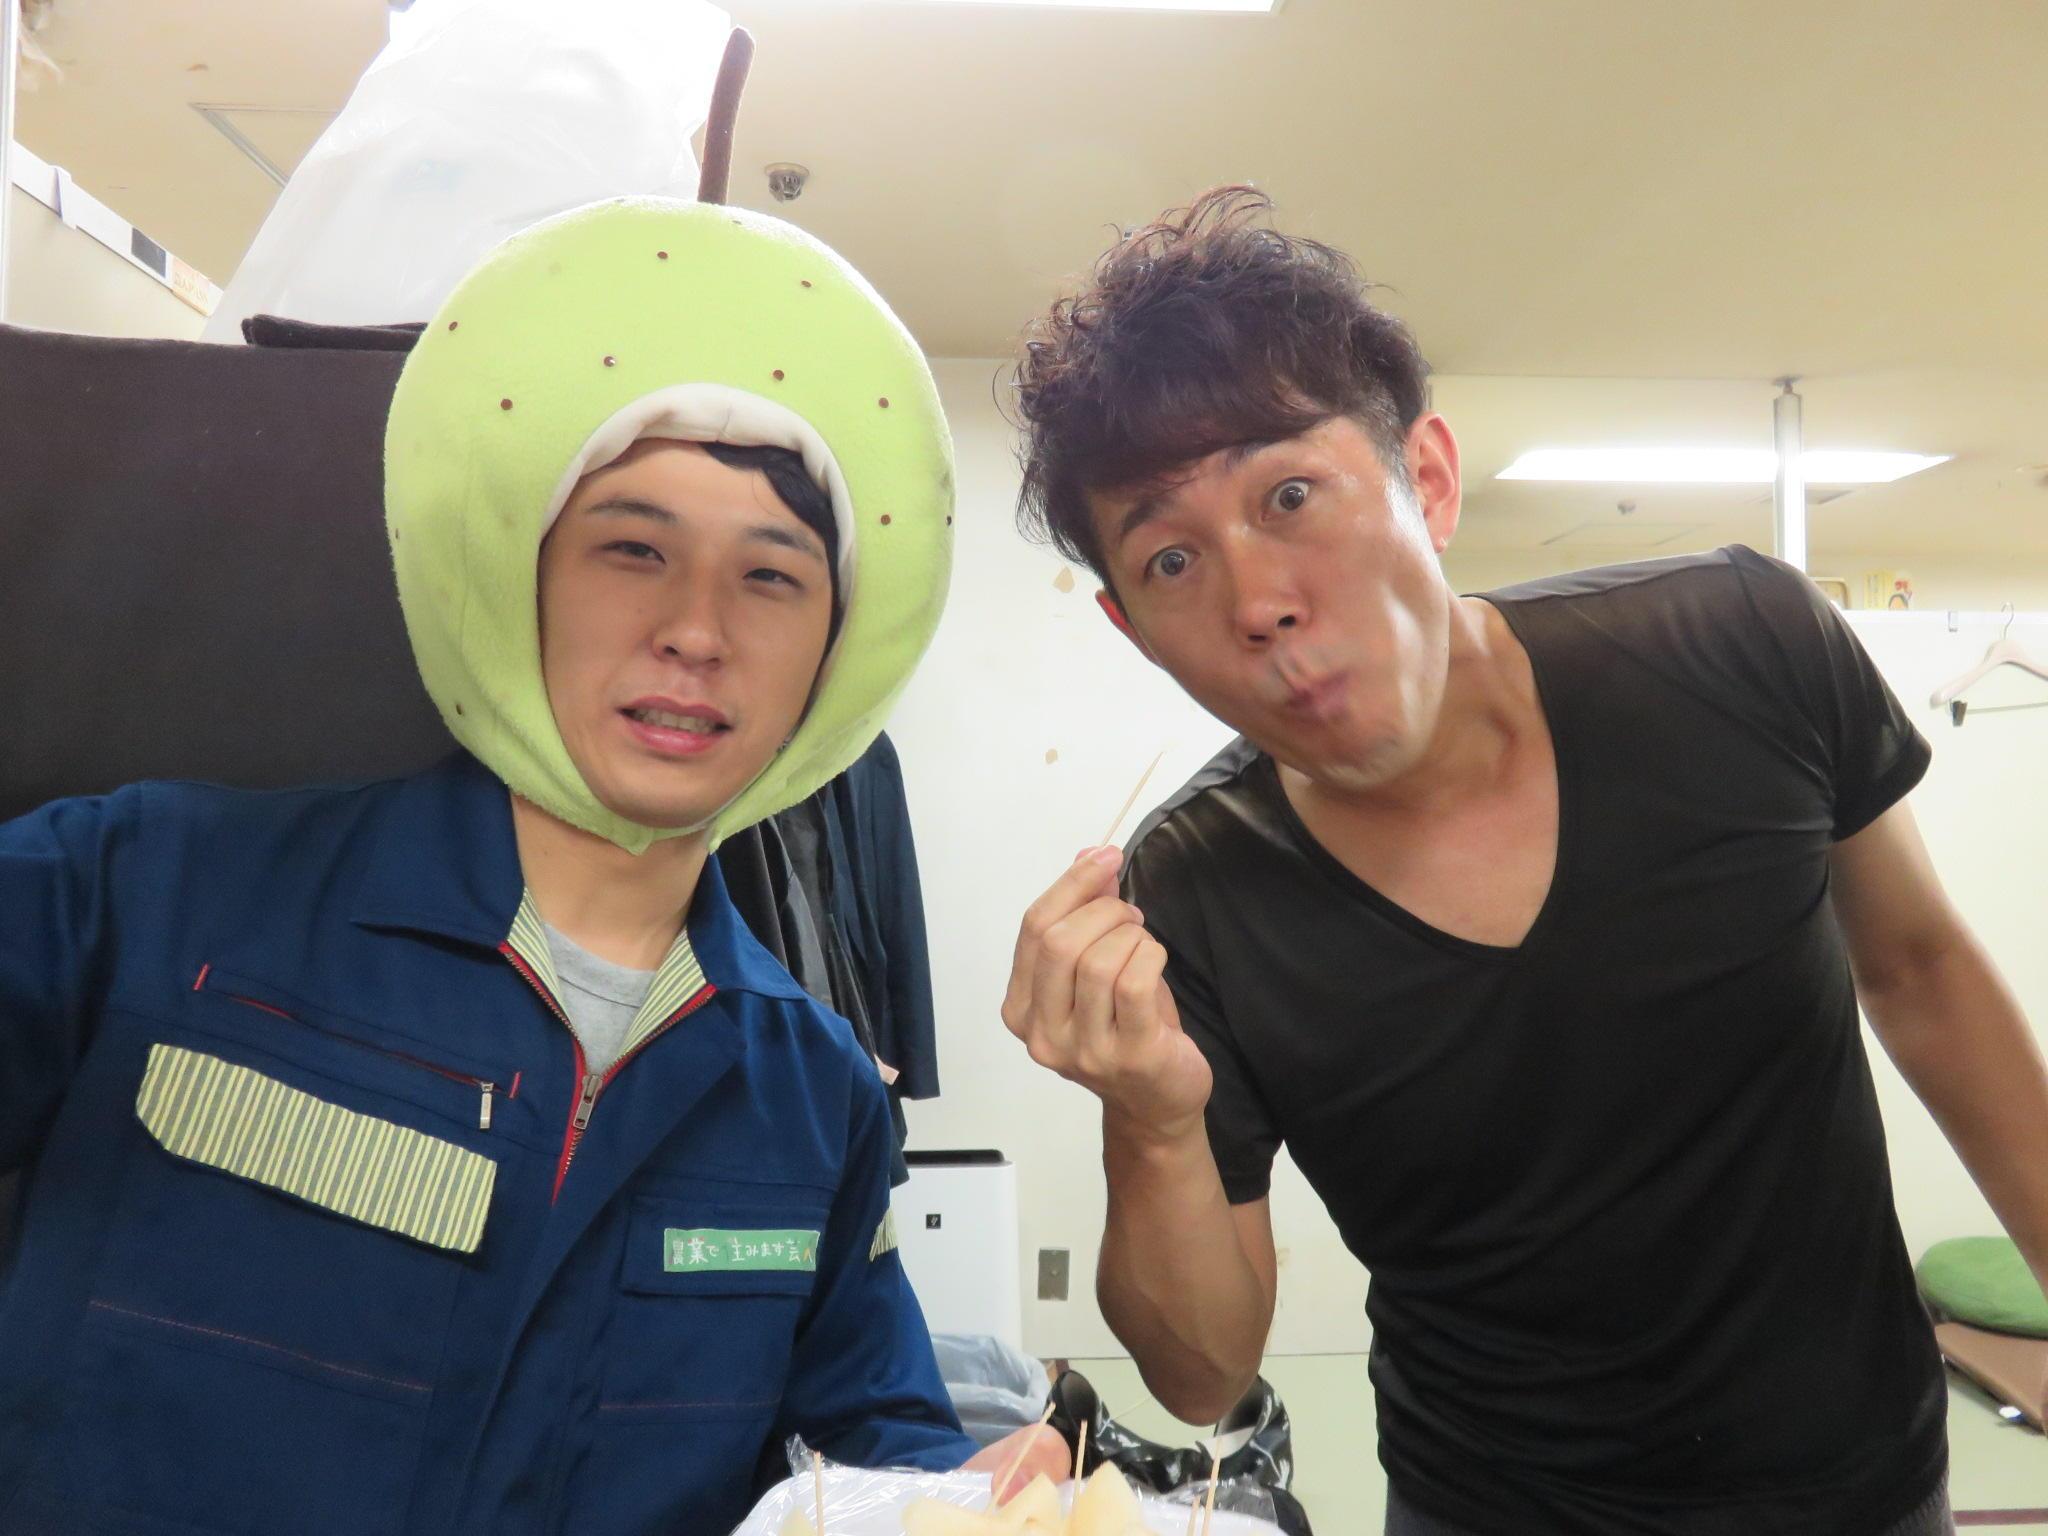 http://news.yoshimoto.co.jp/20170909015049-914b910bfda48c5a61729de0cb8716ed51abf218.jpg